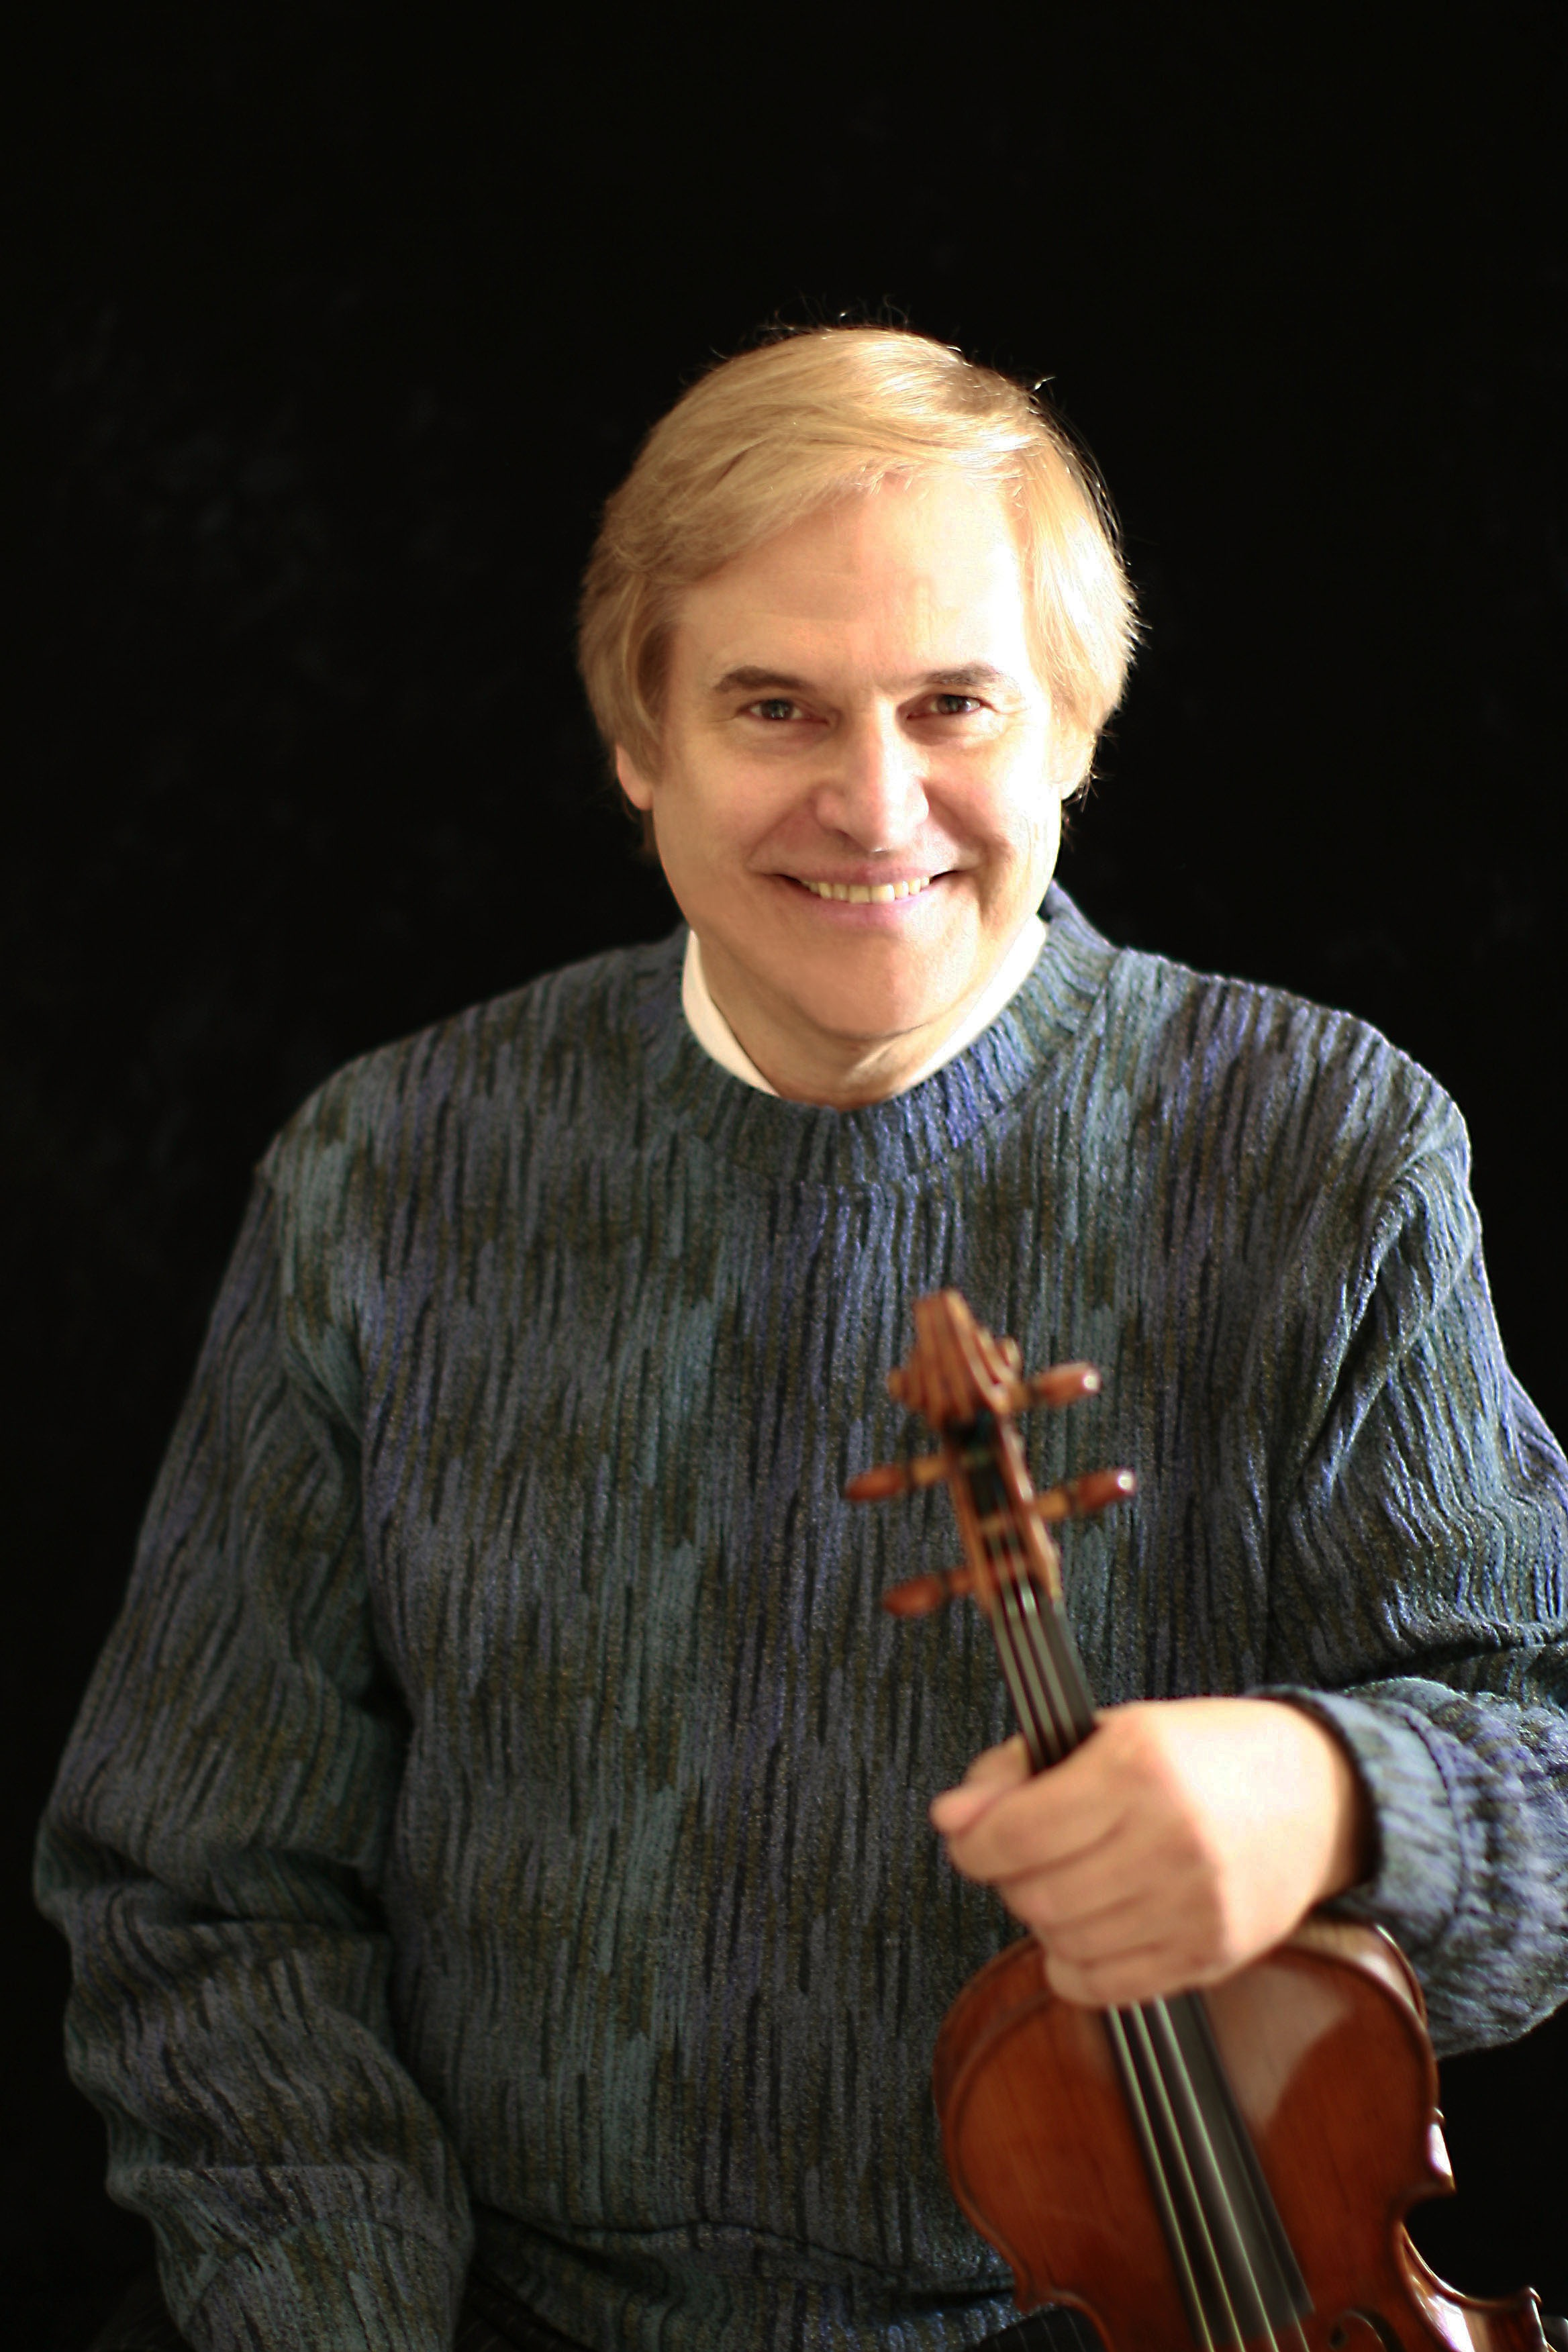 Daniel Kobialka